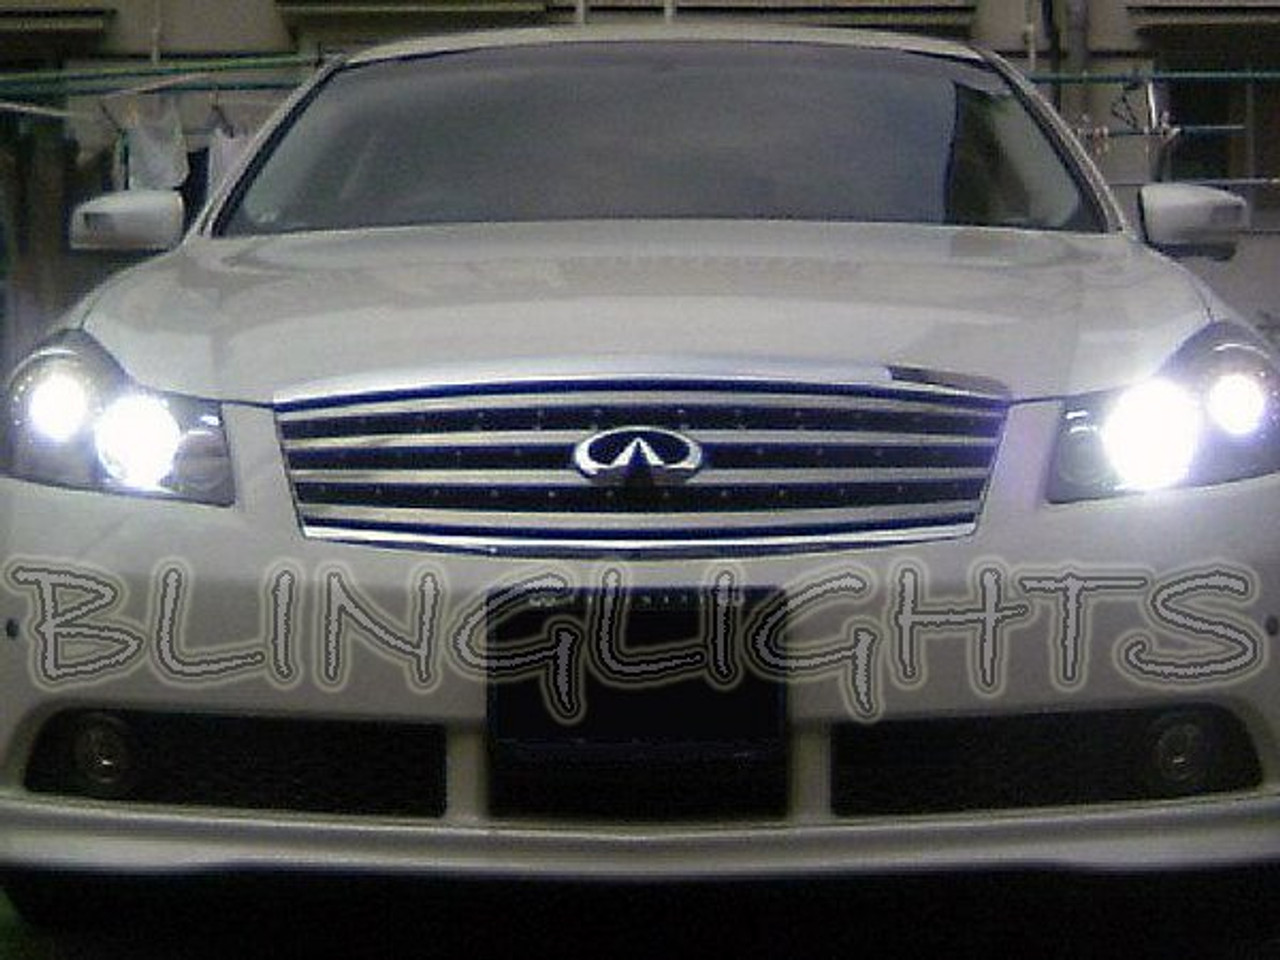 2006 2007 2008 Infiniti M35 M45 Halogen White Bright Headlamps Bulbs Headlights Head Lamps Lights